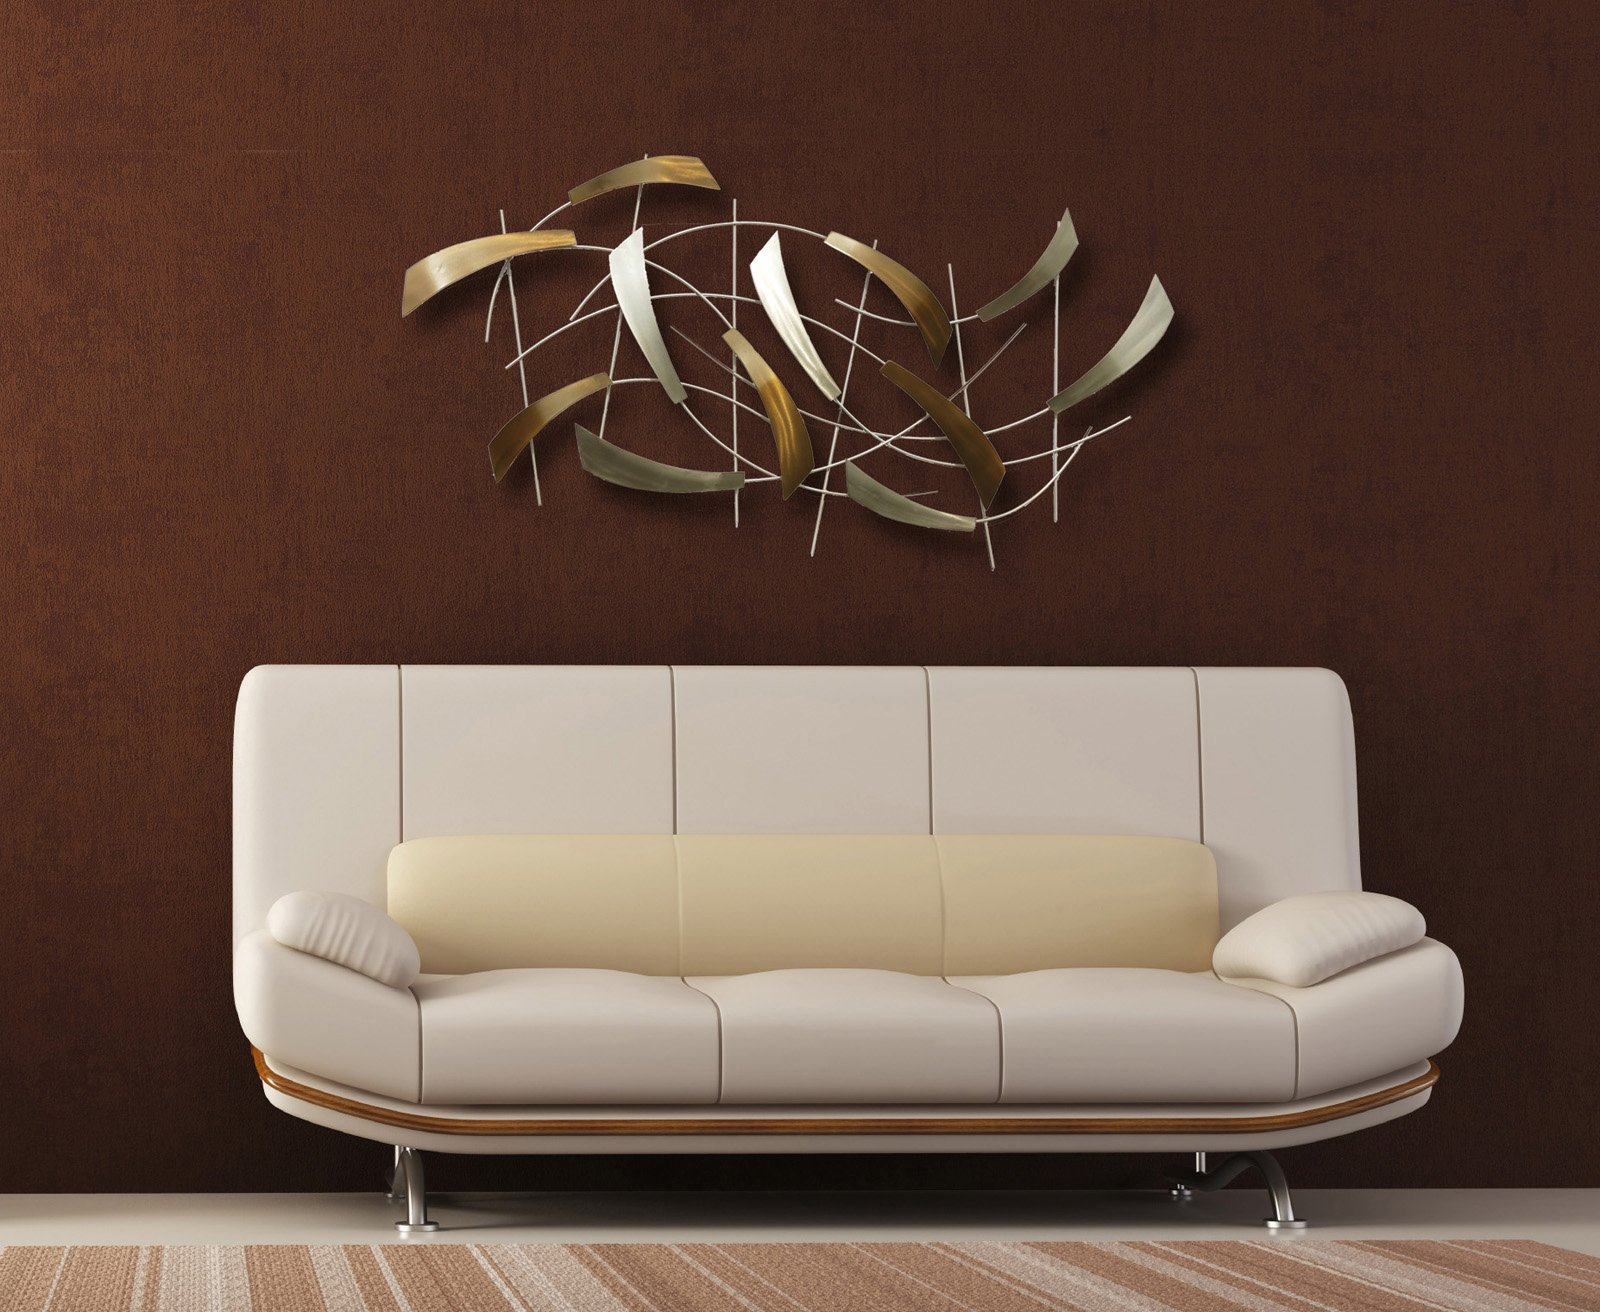 Nova lighting 12652 tidal contemporary wall art wall decor nv 12652 zoom aloadofball Images